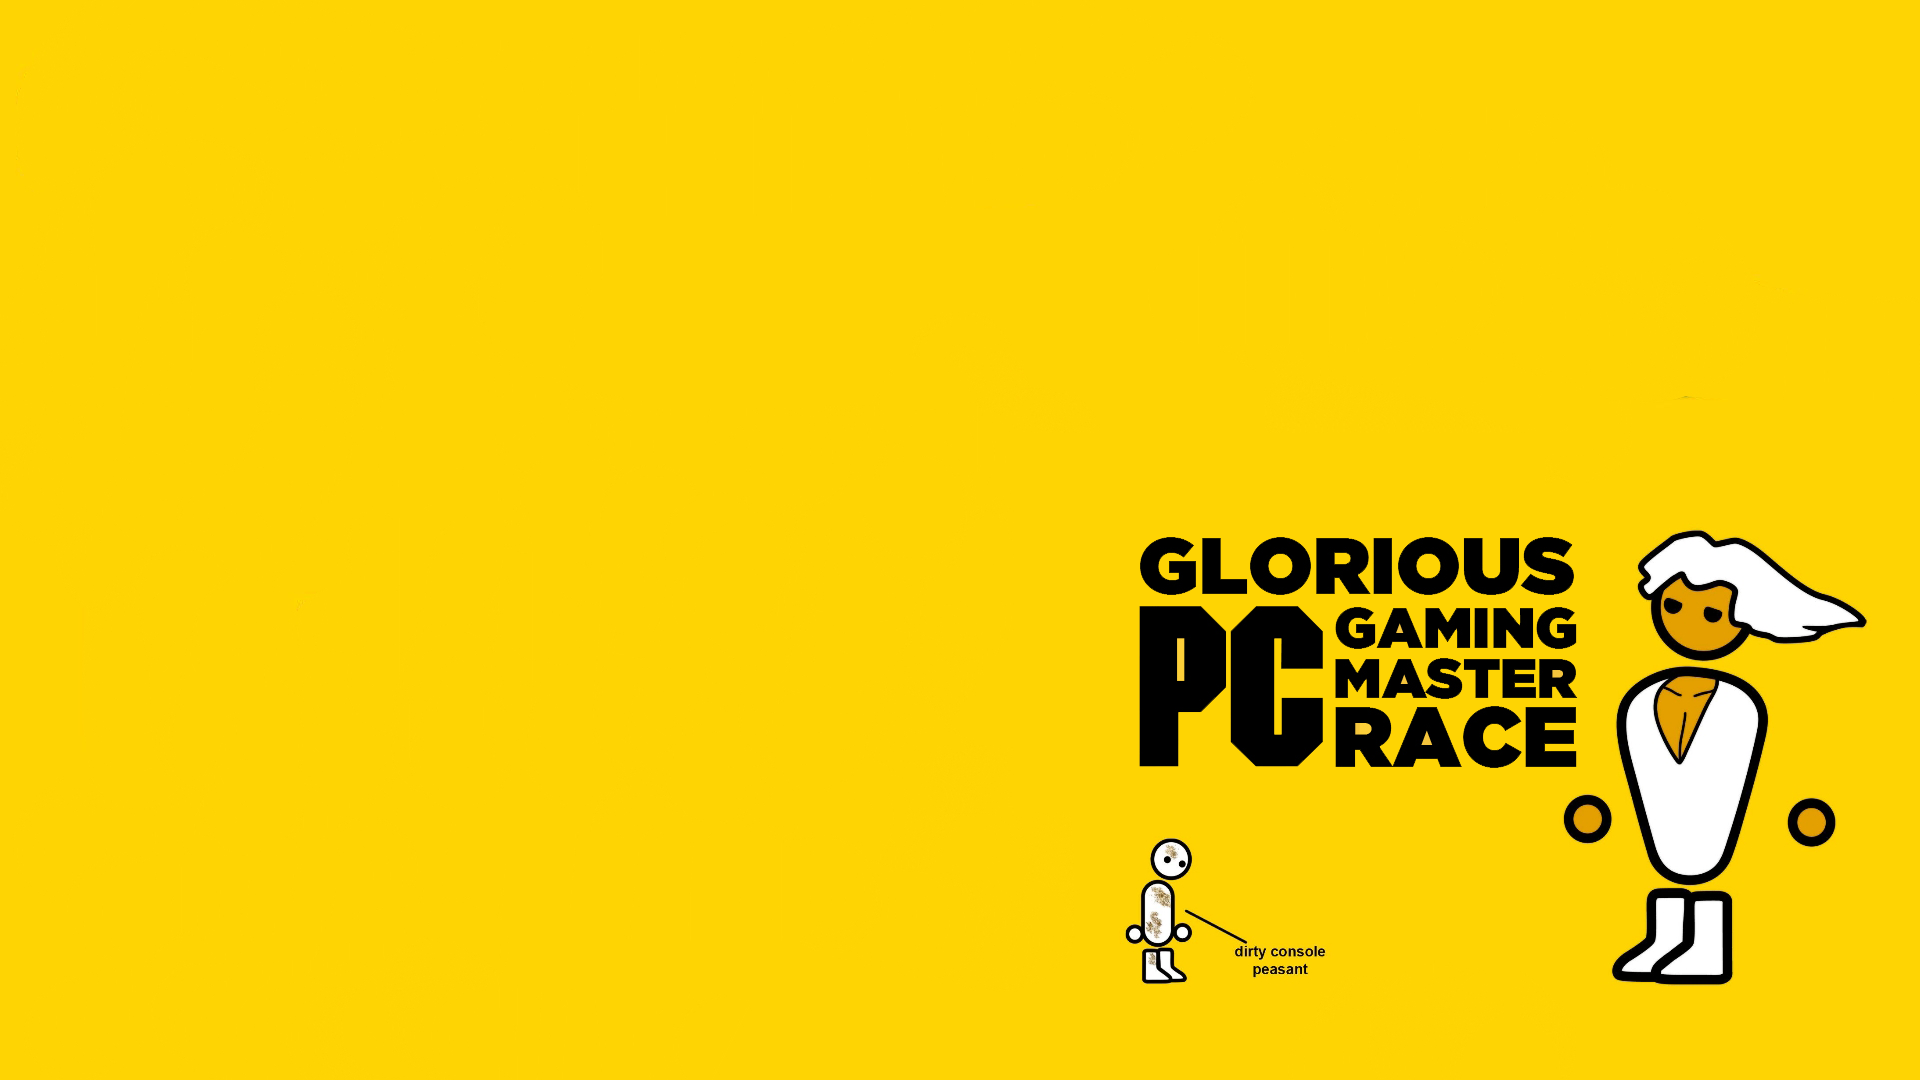 Pc Master Race Fond D Ecran Hd Arriere Plan 1920x1080